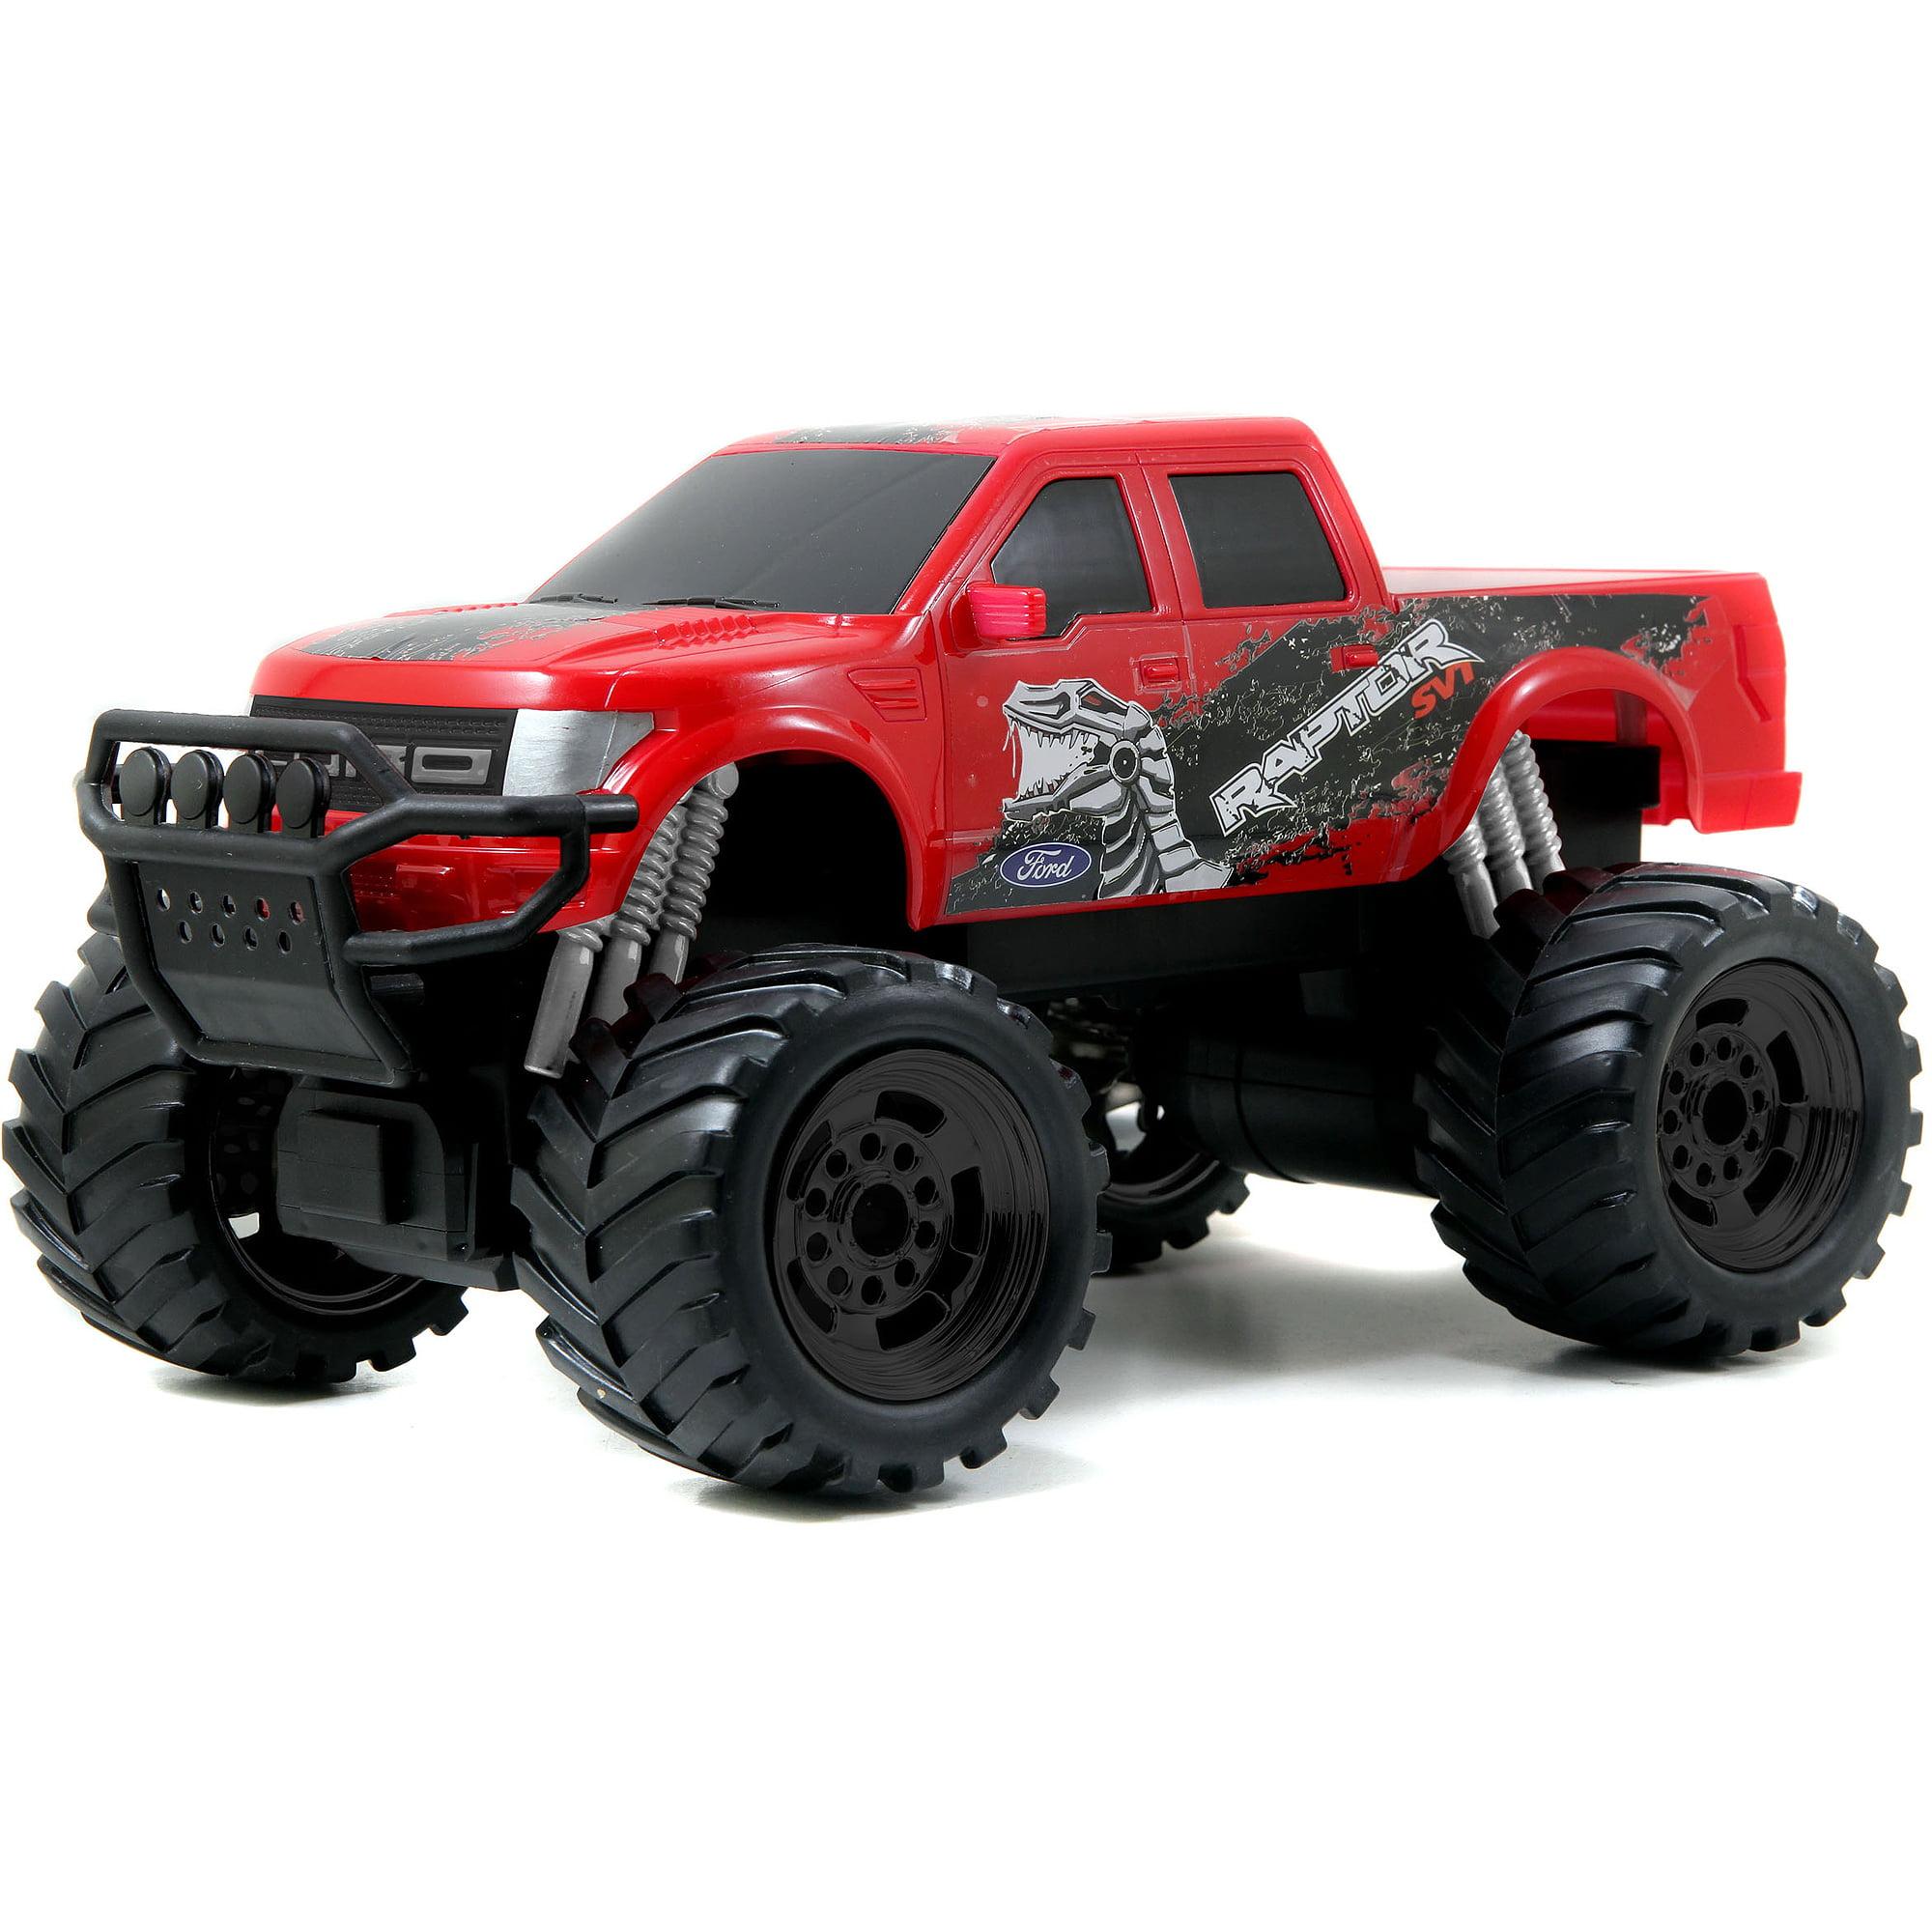 Jada Toys HyperChargers 1:16 Just Trucks Remote Control, 2014 Ford F-150 SVT Raptor